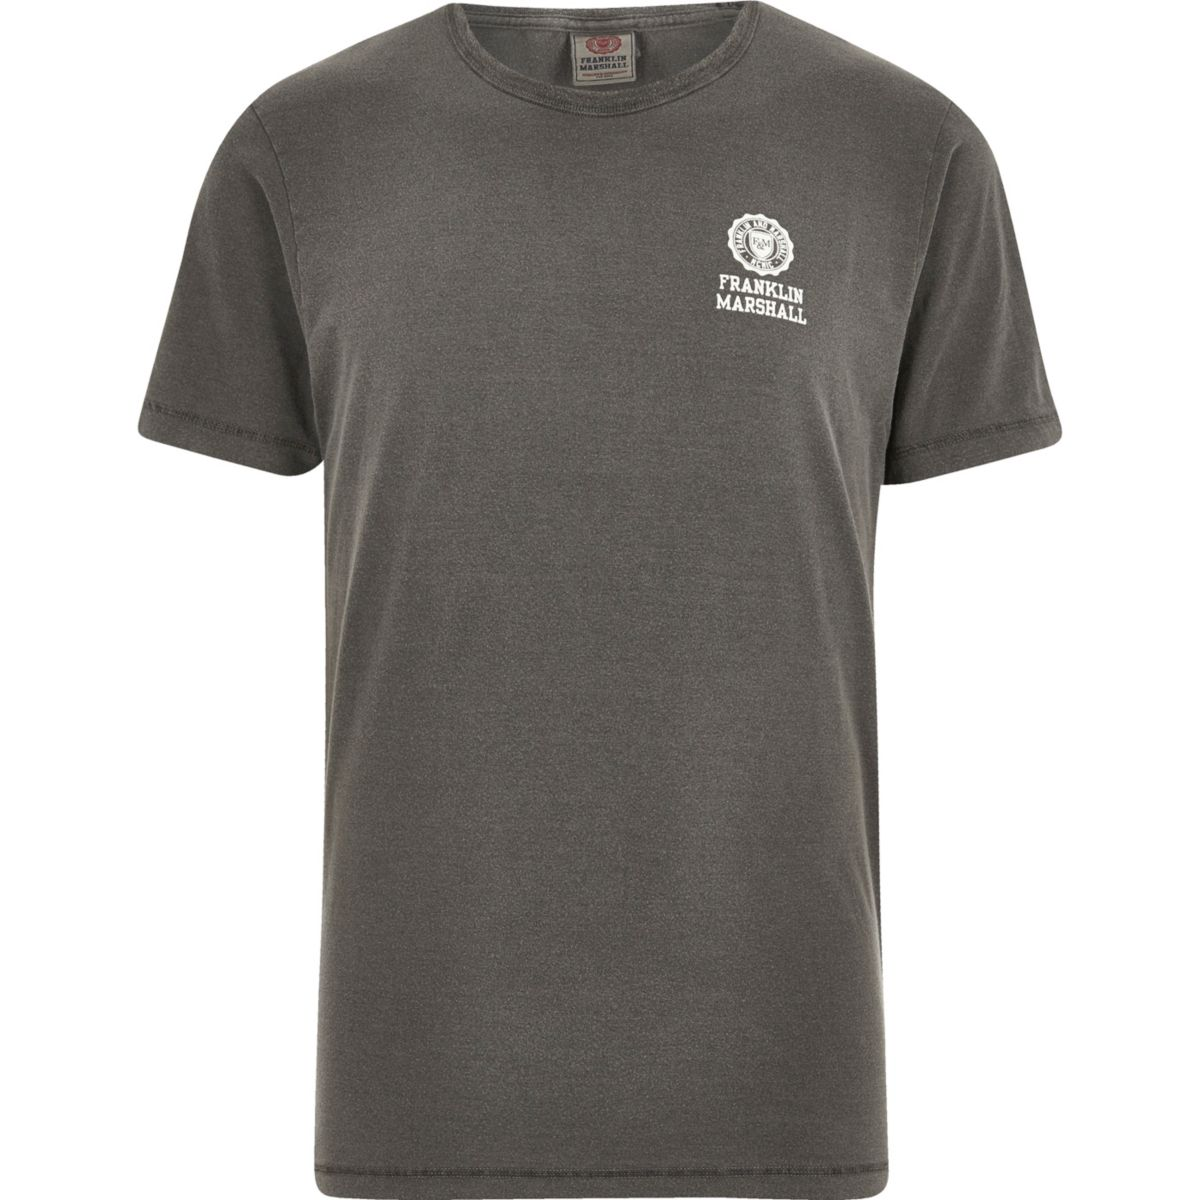 T-shirt imprimé Franklin & Marshall noir